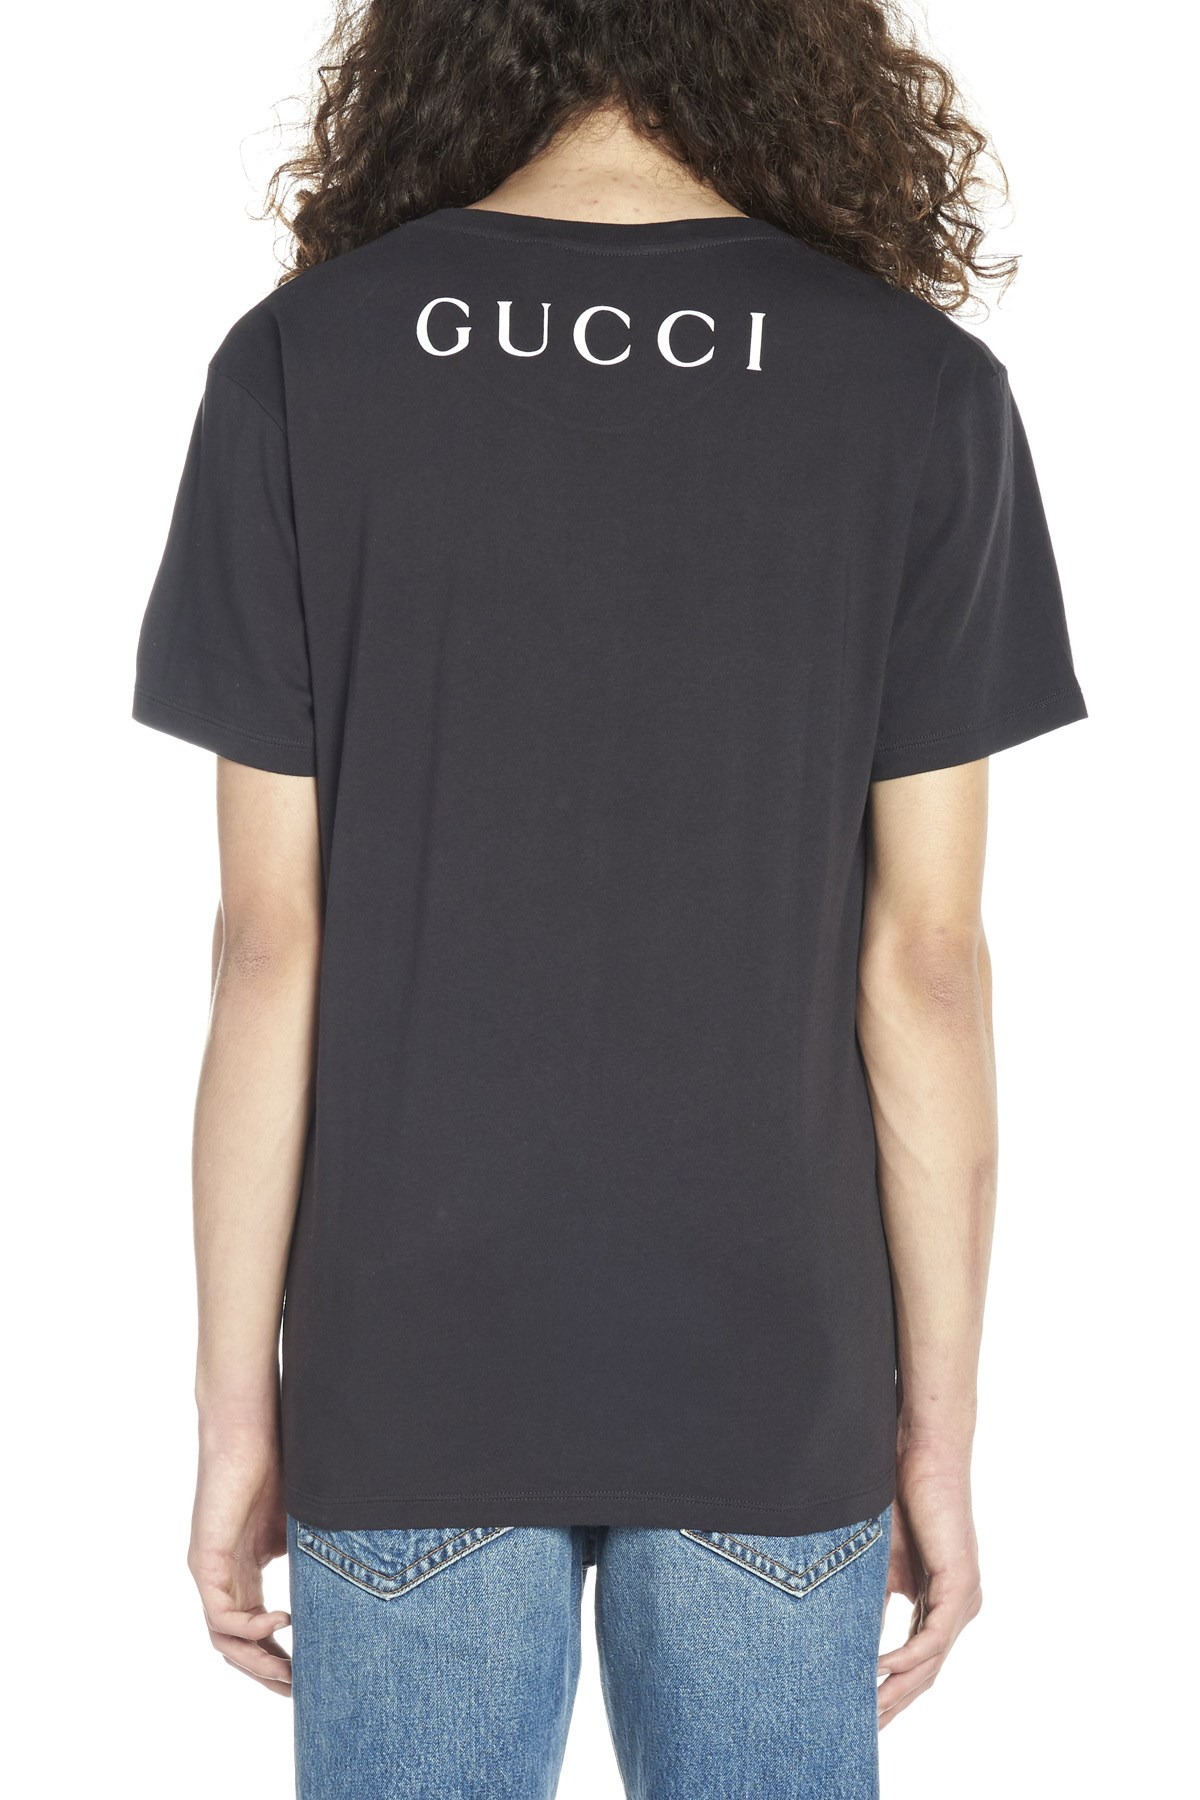 b2b9bf38698 gucci  Gucci Metal  T-Shirt available on julian-fashion.com - 60500